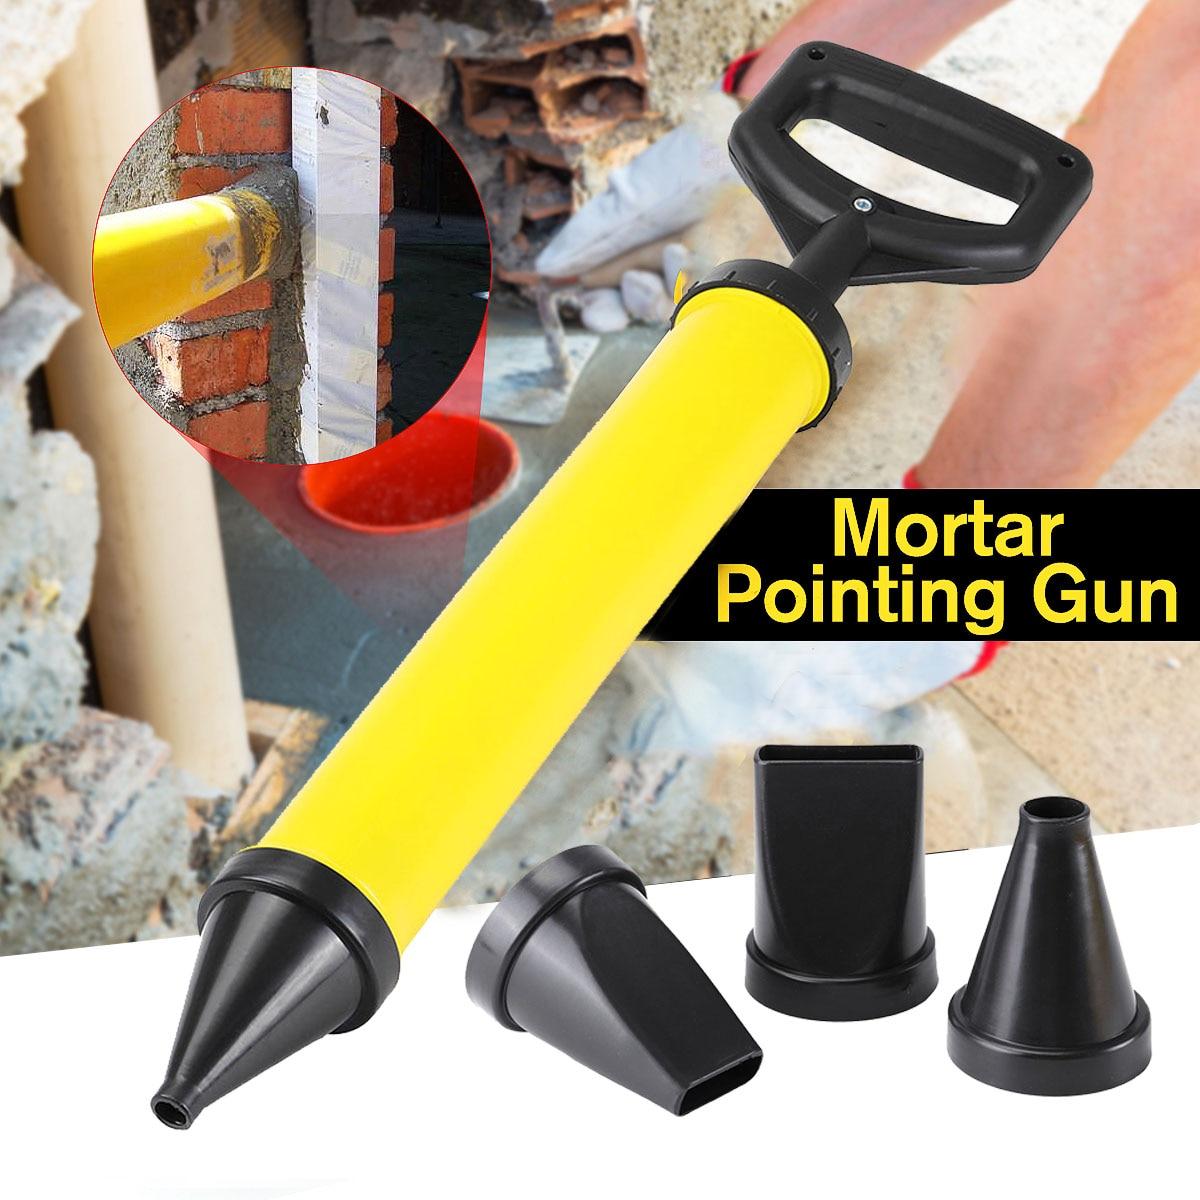 4pcs Nozzles Cement Lime Hand Tool Set Caulking Spray Guns Pointing Brick Grouting Mortar Sprayer Applicator Hand Tool Set